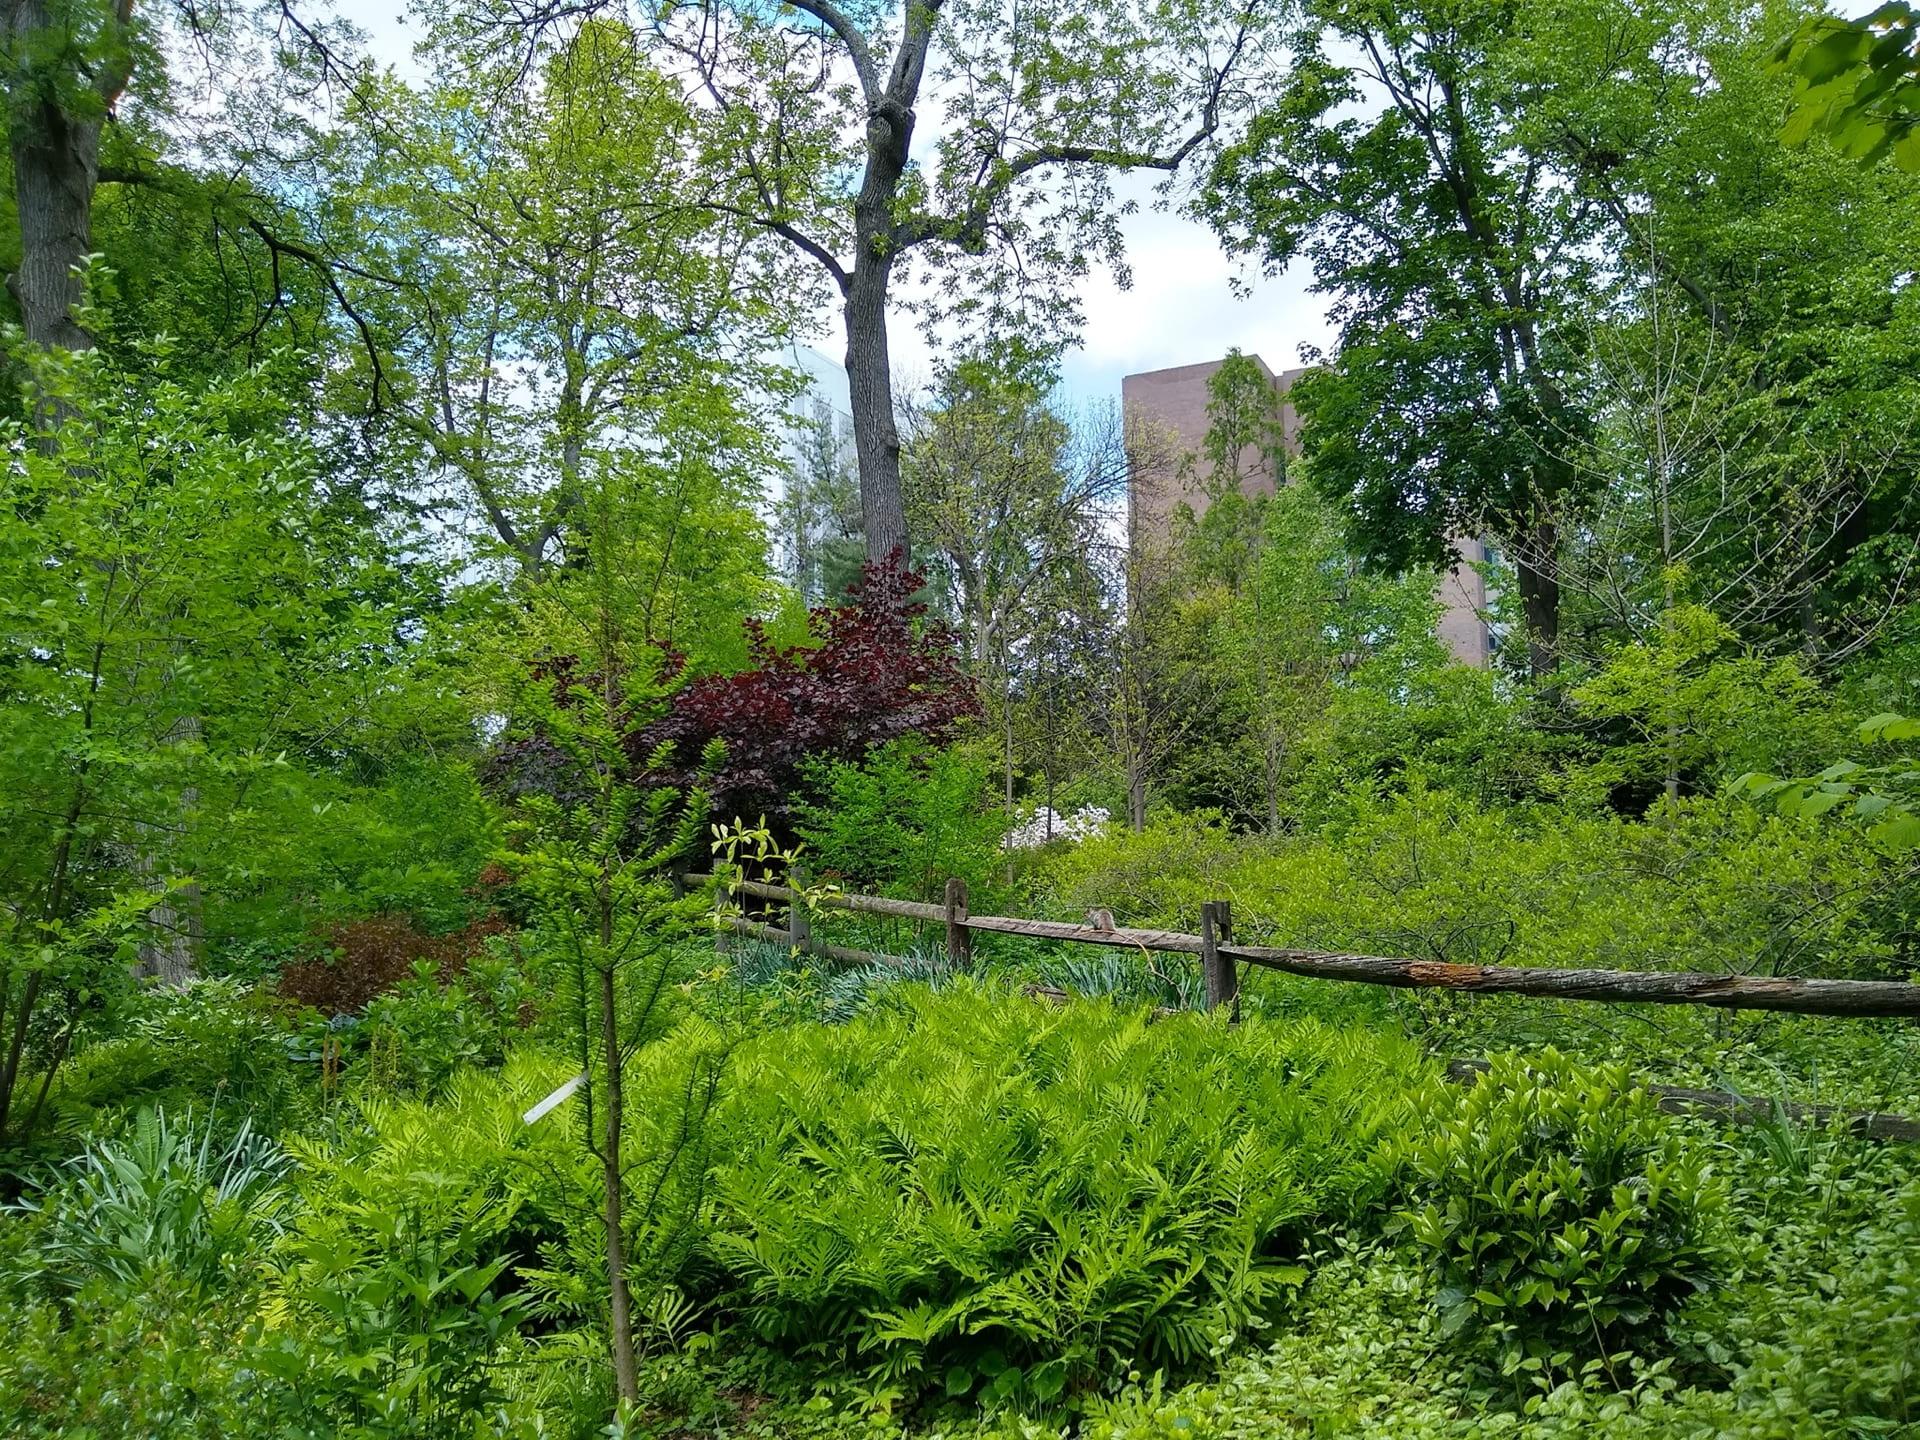 Vibrant fresh foliage of the park.